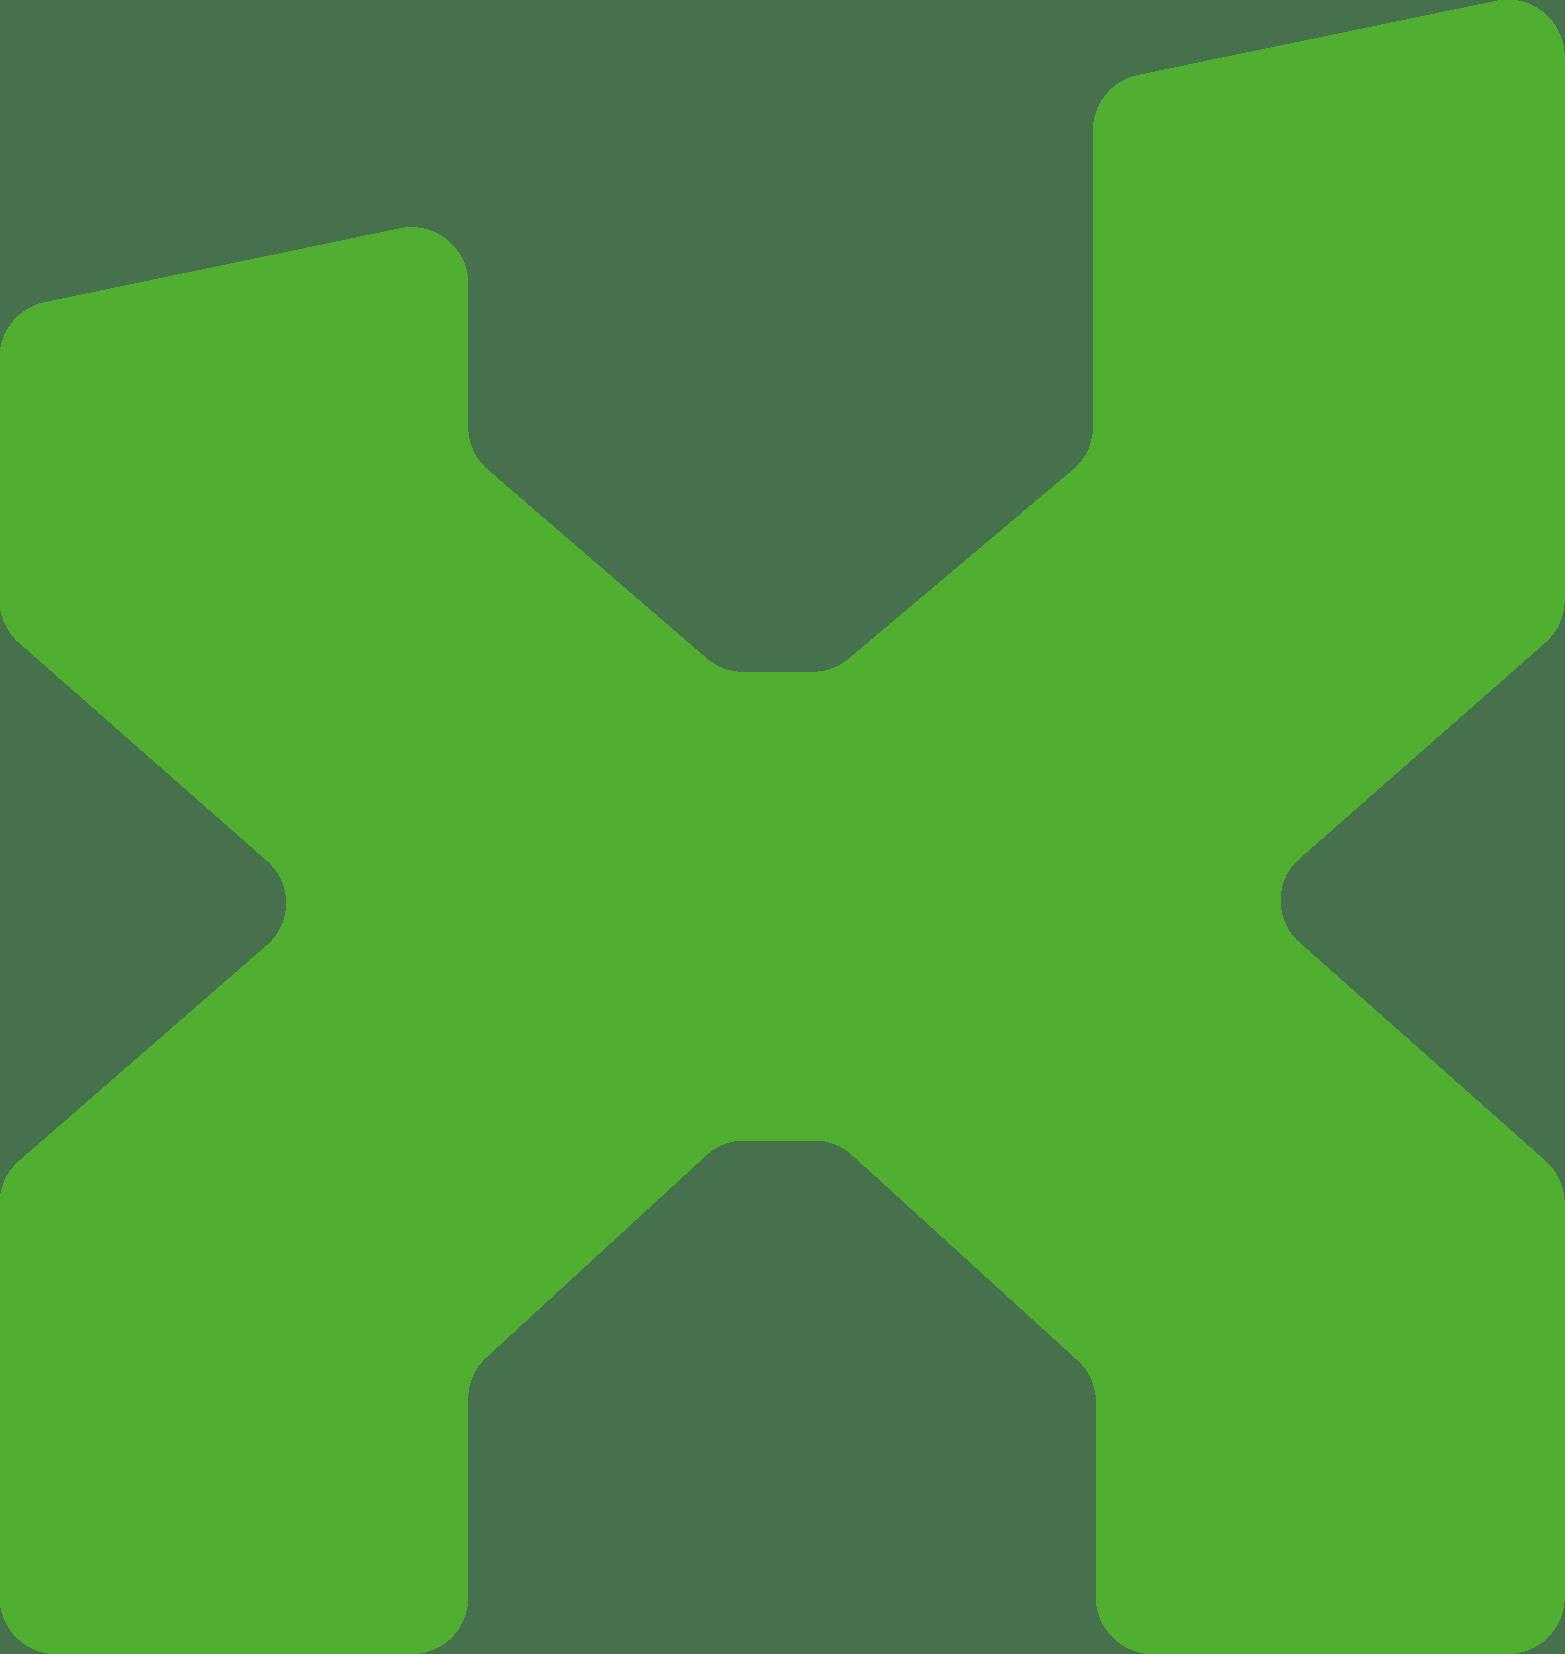 itmX - NTT DATA Business Solutions